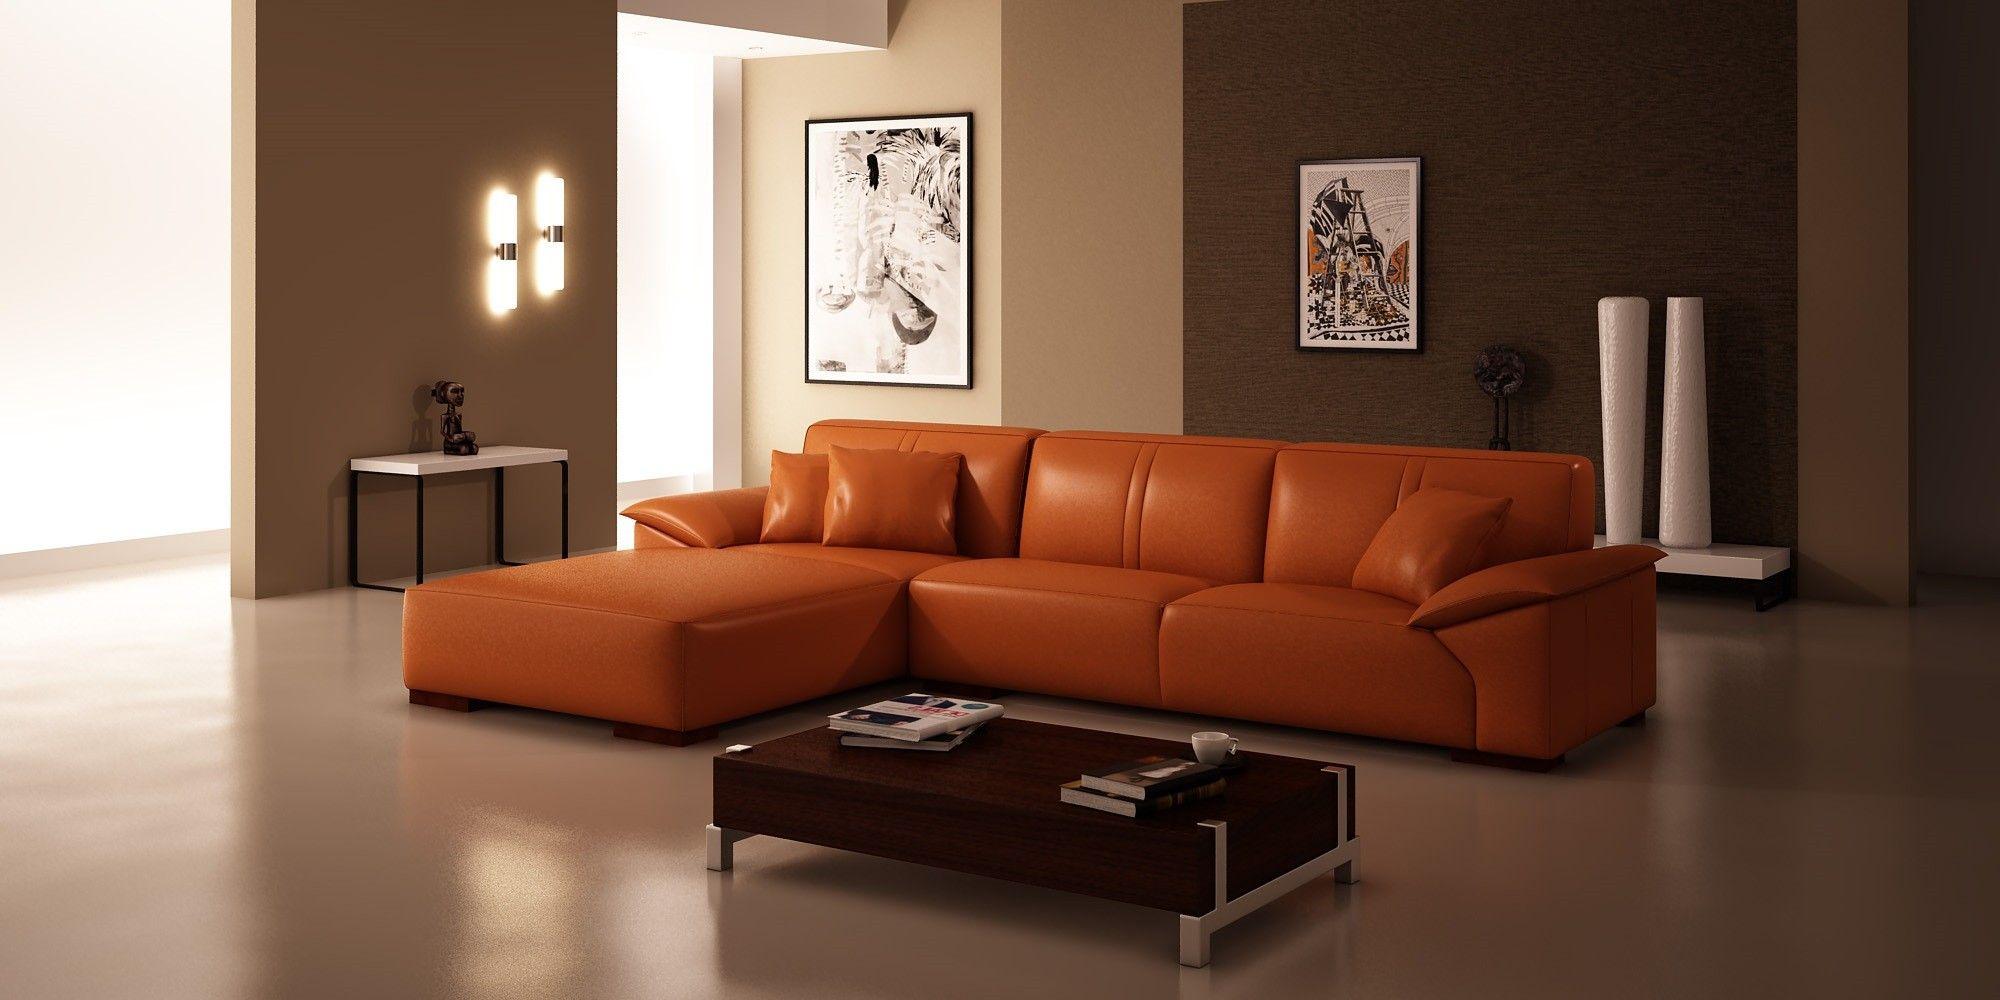 Pin By Mrs Davis On Home Final Living Room Orange Orange